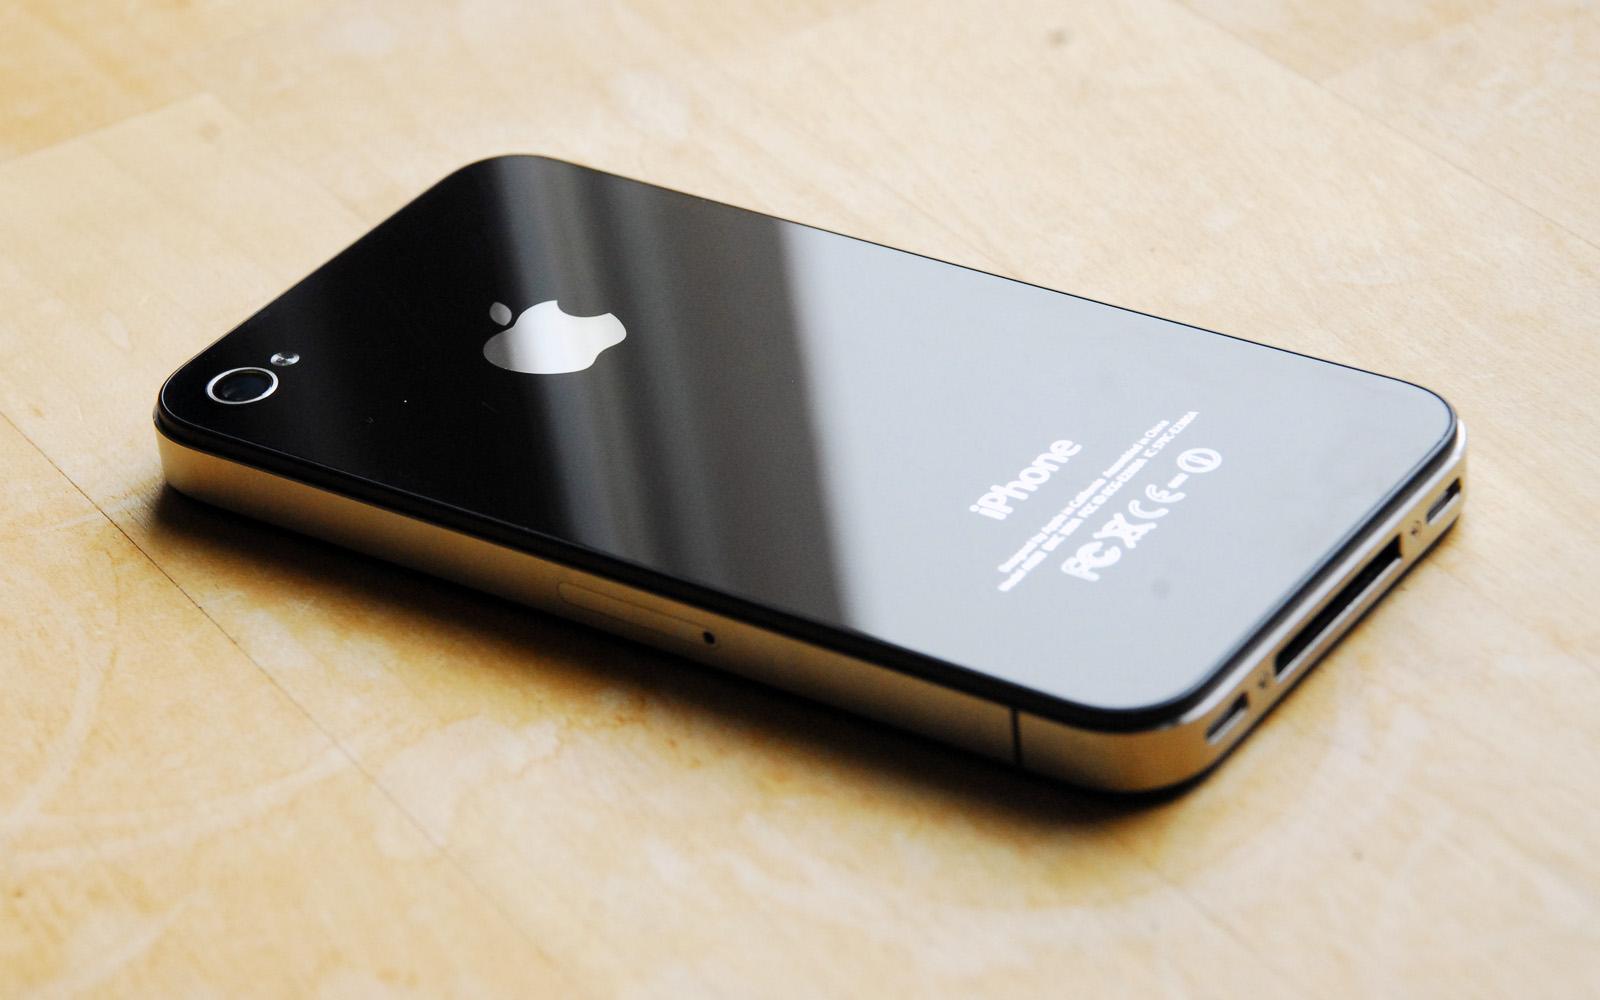 Apple iPhone 4S - описание, характеристики, тест